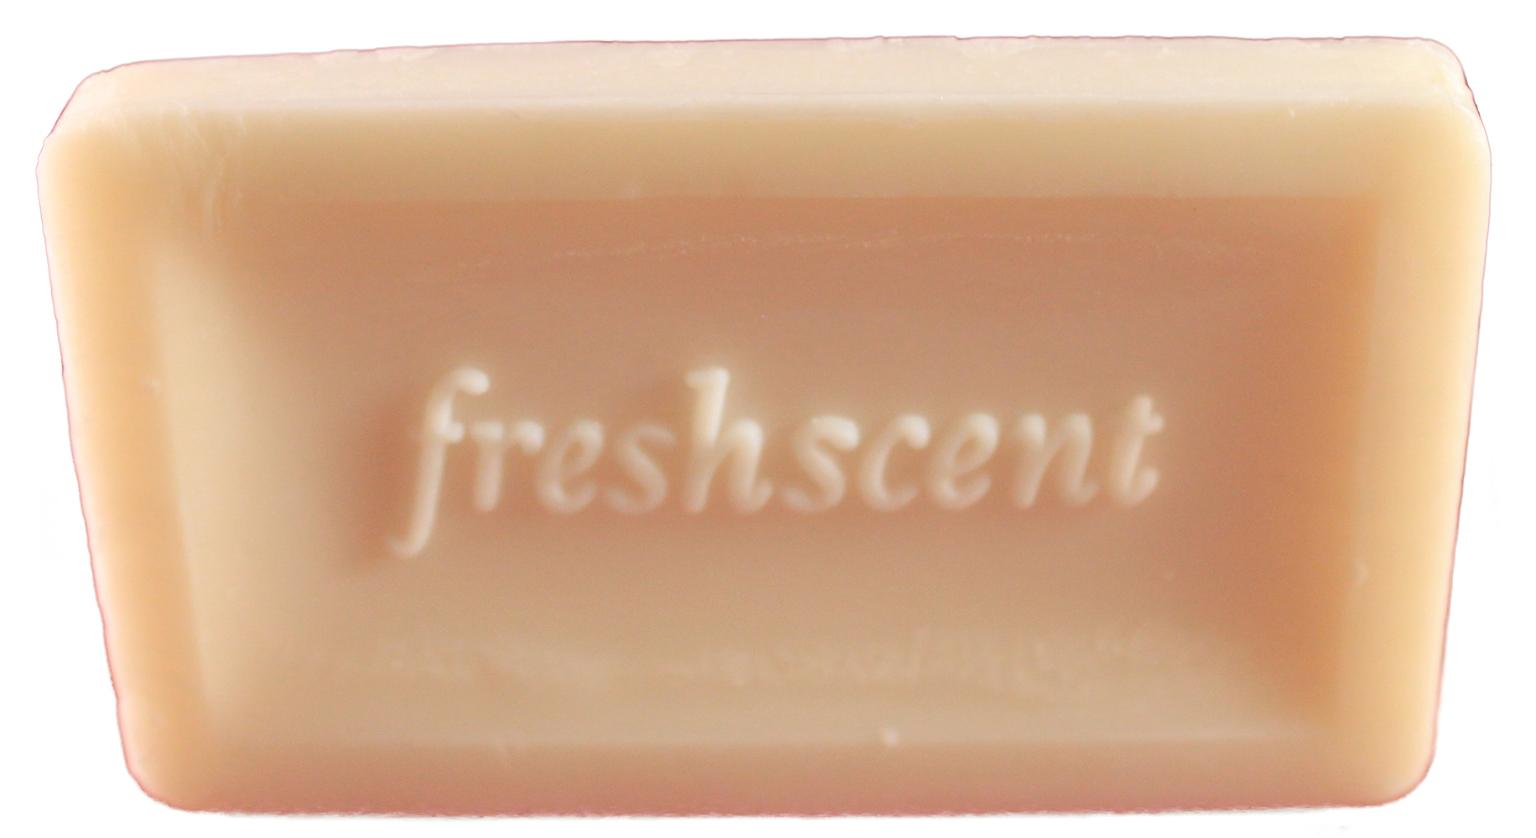 Freshscent Unwrapped Deodorant Bar SOAP .35 oz [1077460]